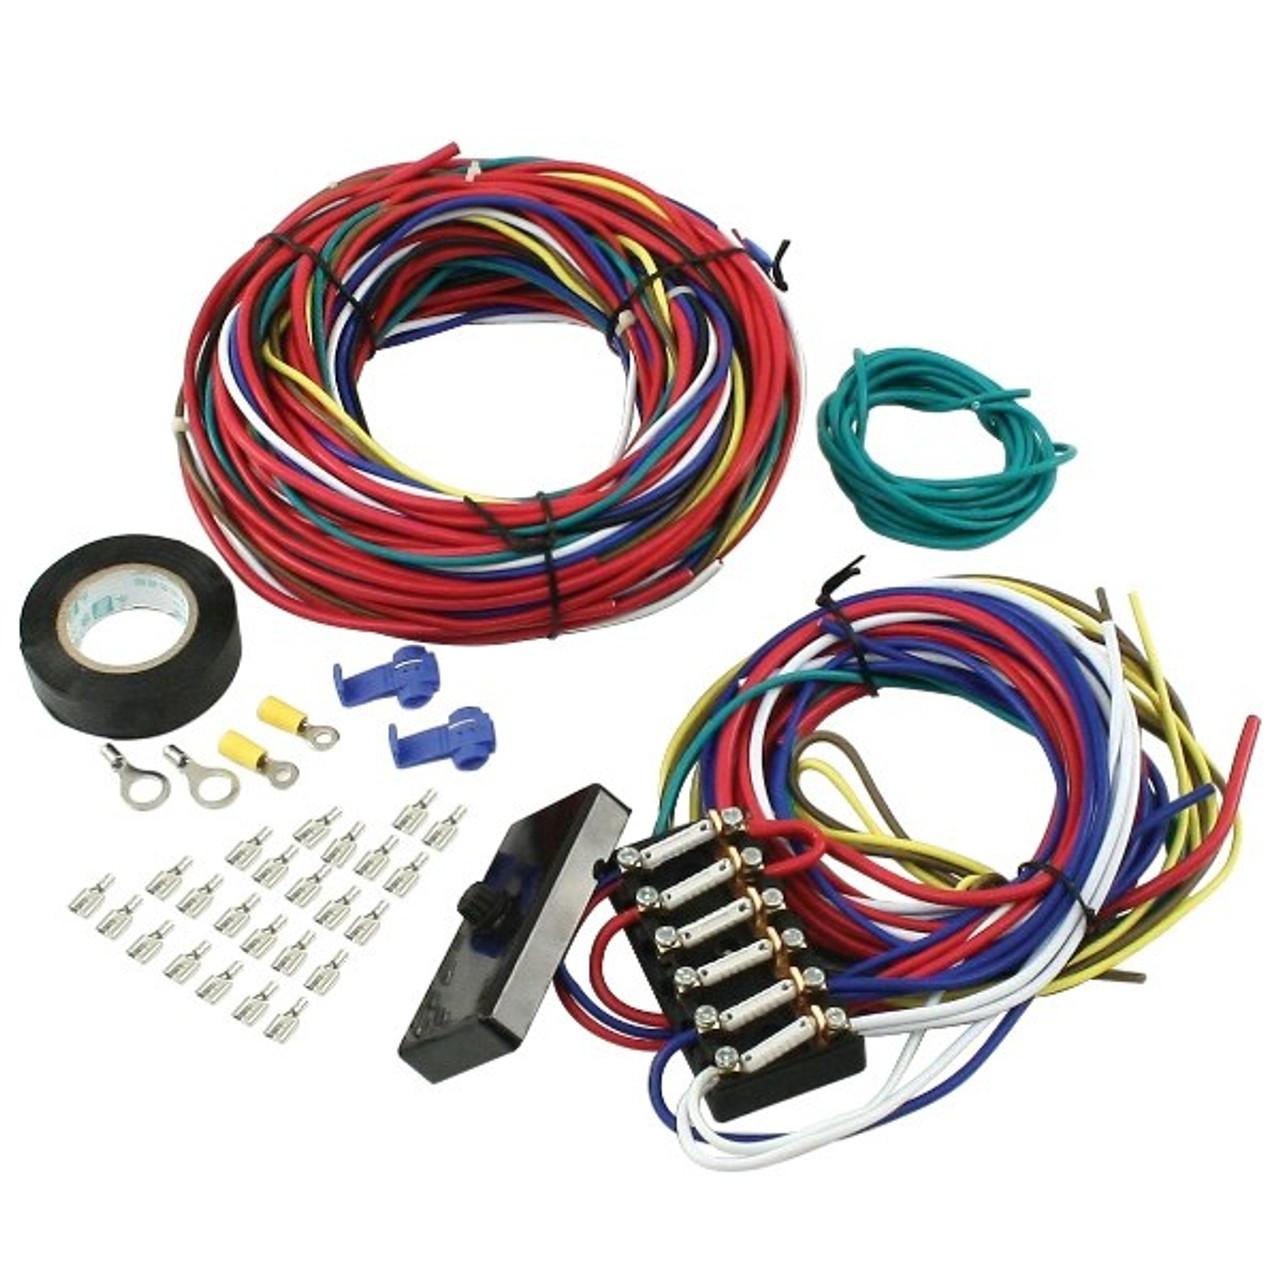 Manx Wiring Harness - Wiring Diagram Dash on vw coil wiring, vw beetle carburetor wiring, vw starter wiring, vw bus regulator wiring, dual car stereo wire harness, figure 8 cat harness, goldfish harness, vw bus wiring location, vw engine wiring, vw alternator wiring, 2001 jetta dome light harness, 68 vw wire harness, besi harness, vw headlight wiring, vw wiring kit, vw wiring diagrams, vw ignition wiring,